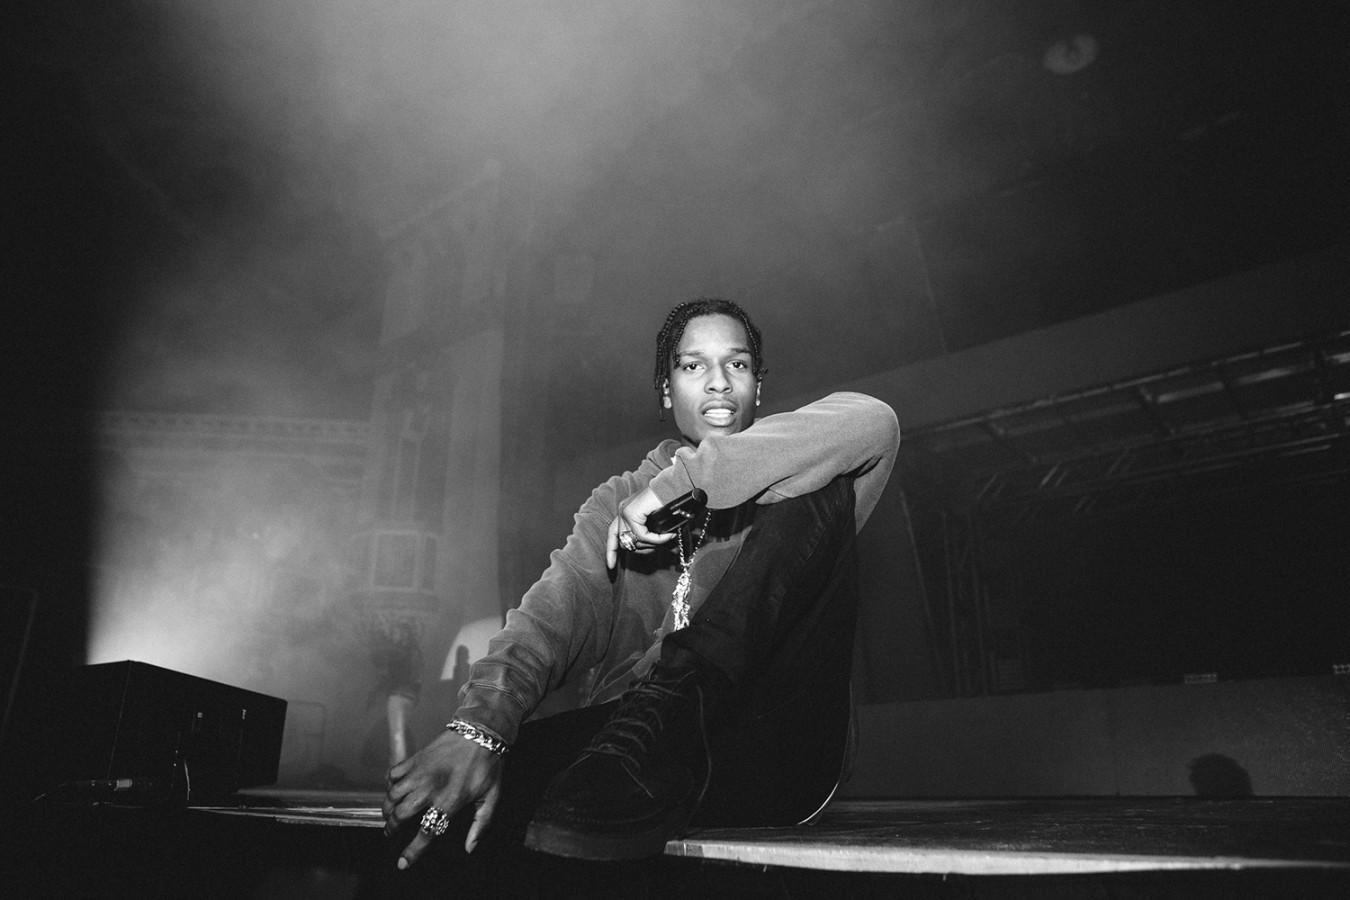 asap-rocky-tyler-the-creator-tour-backstage-30-1350x900